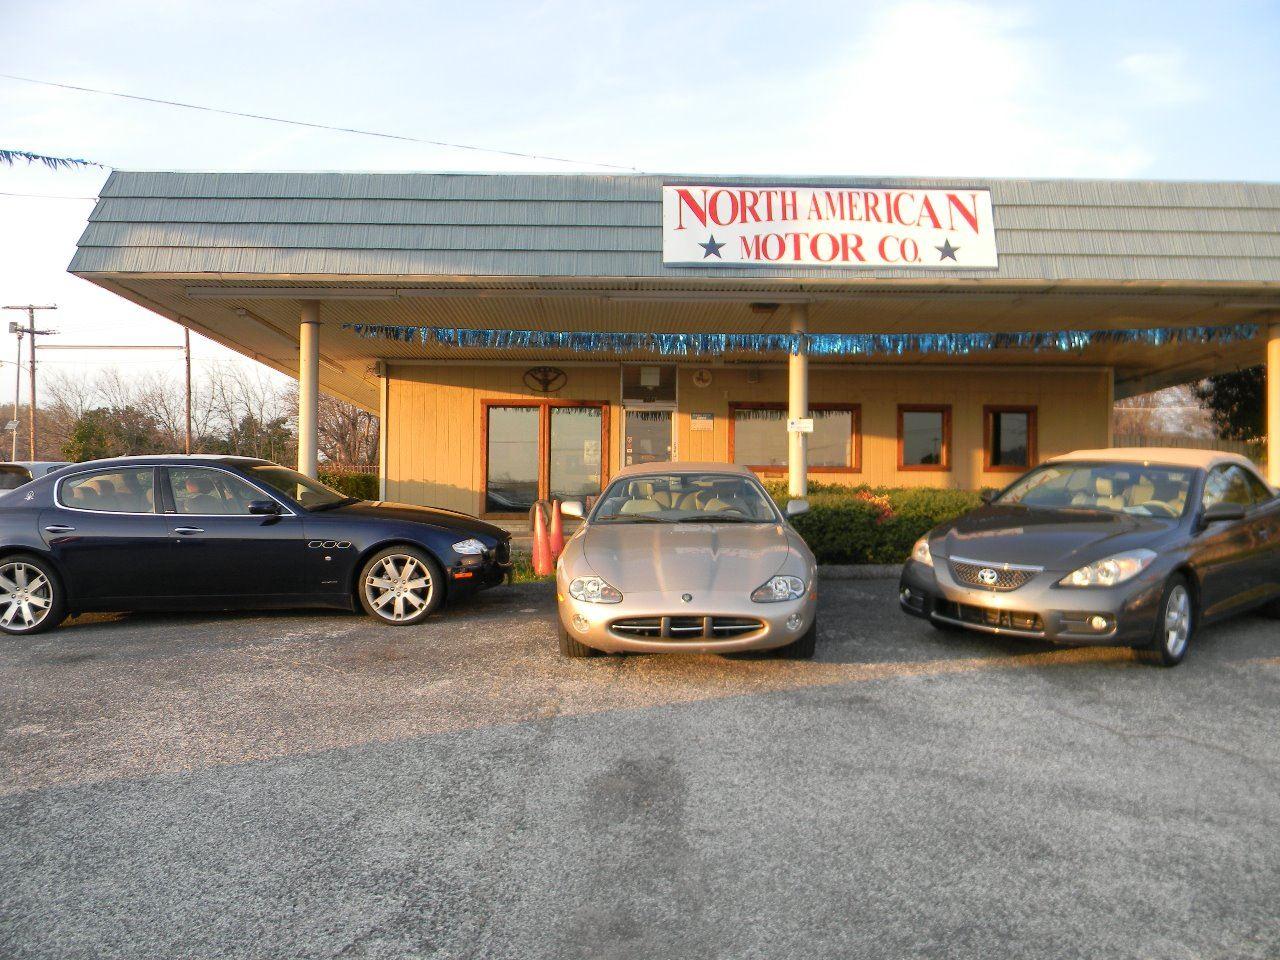 North American Motor Company